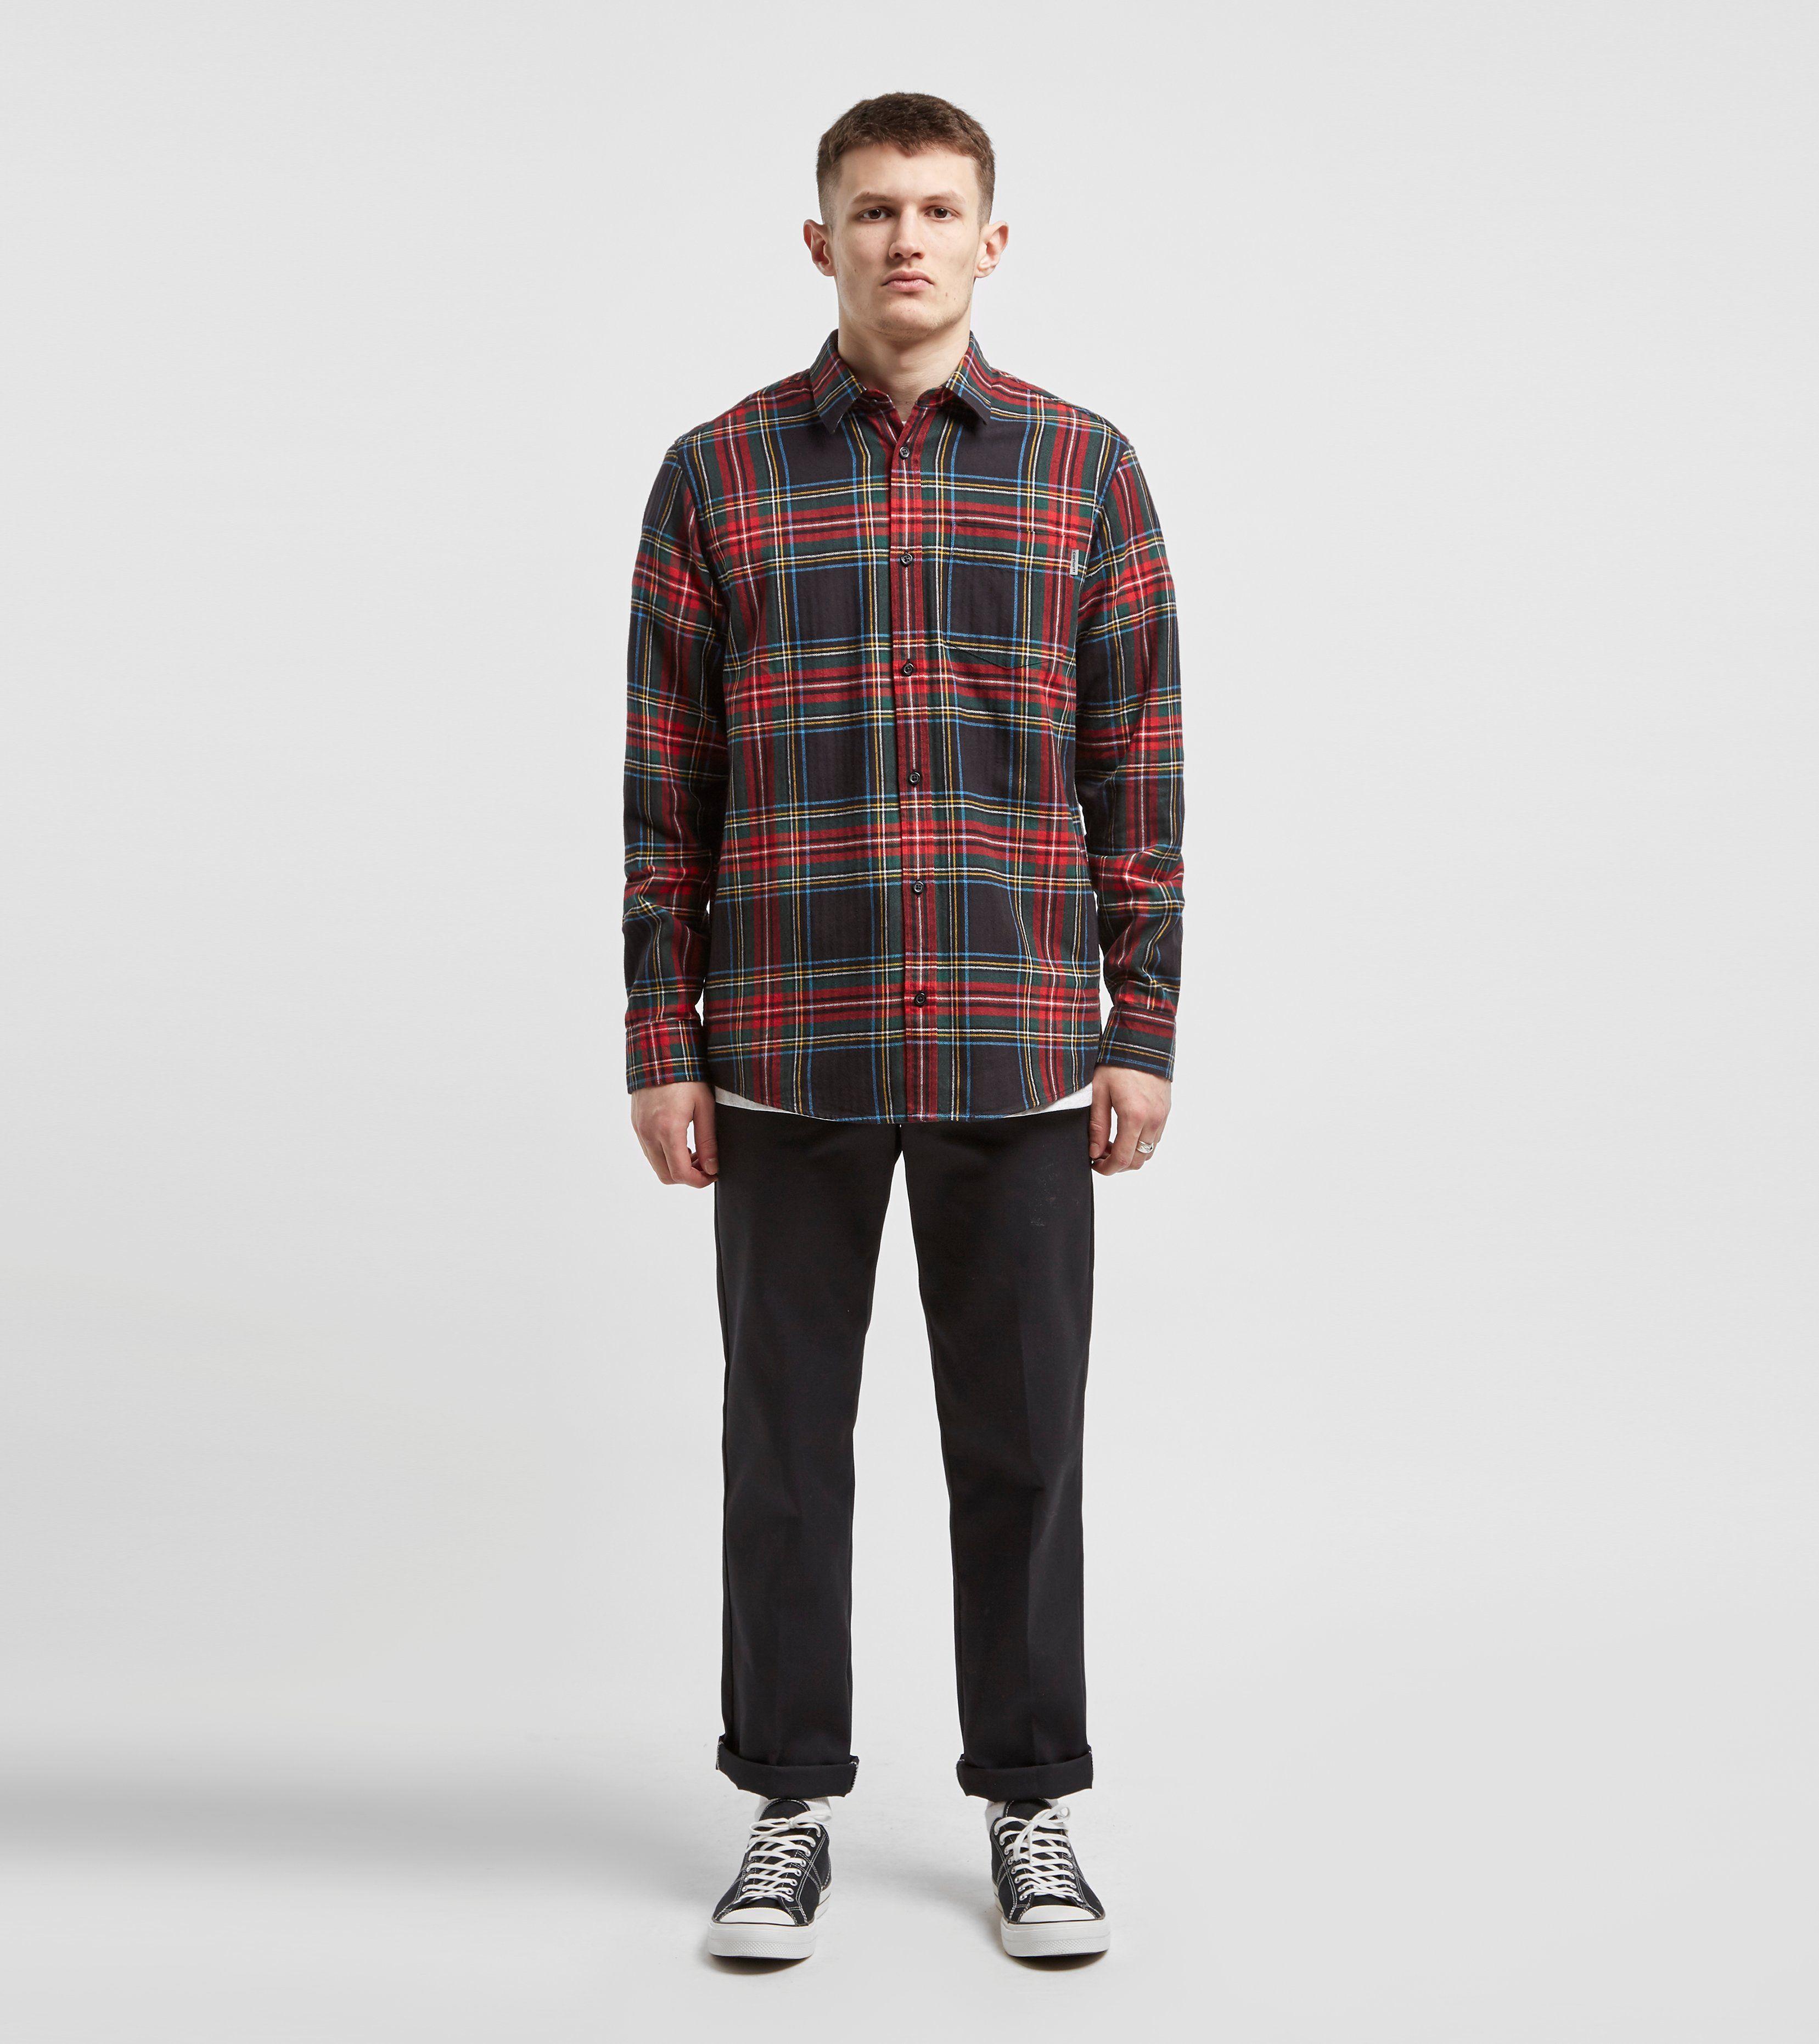 Carhartt WIP Vigo Long Sleeve Shirt